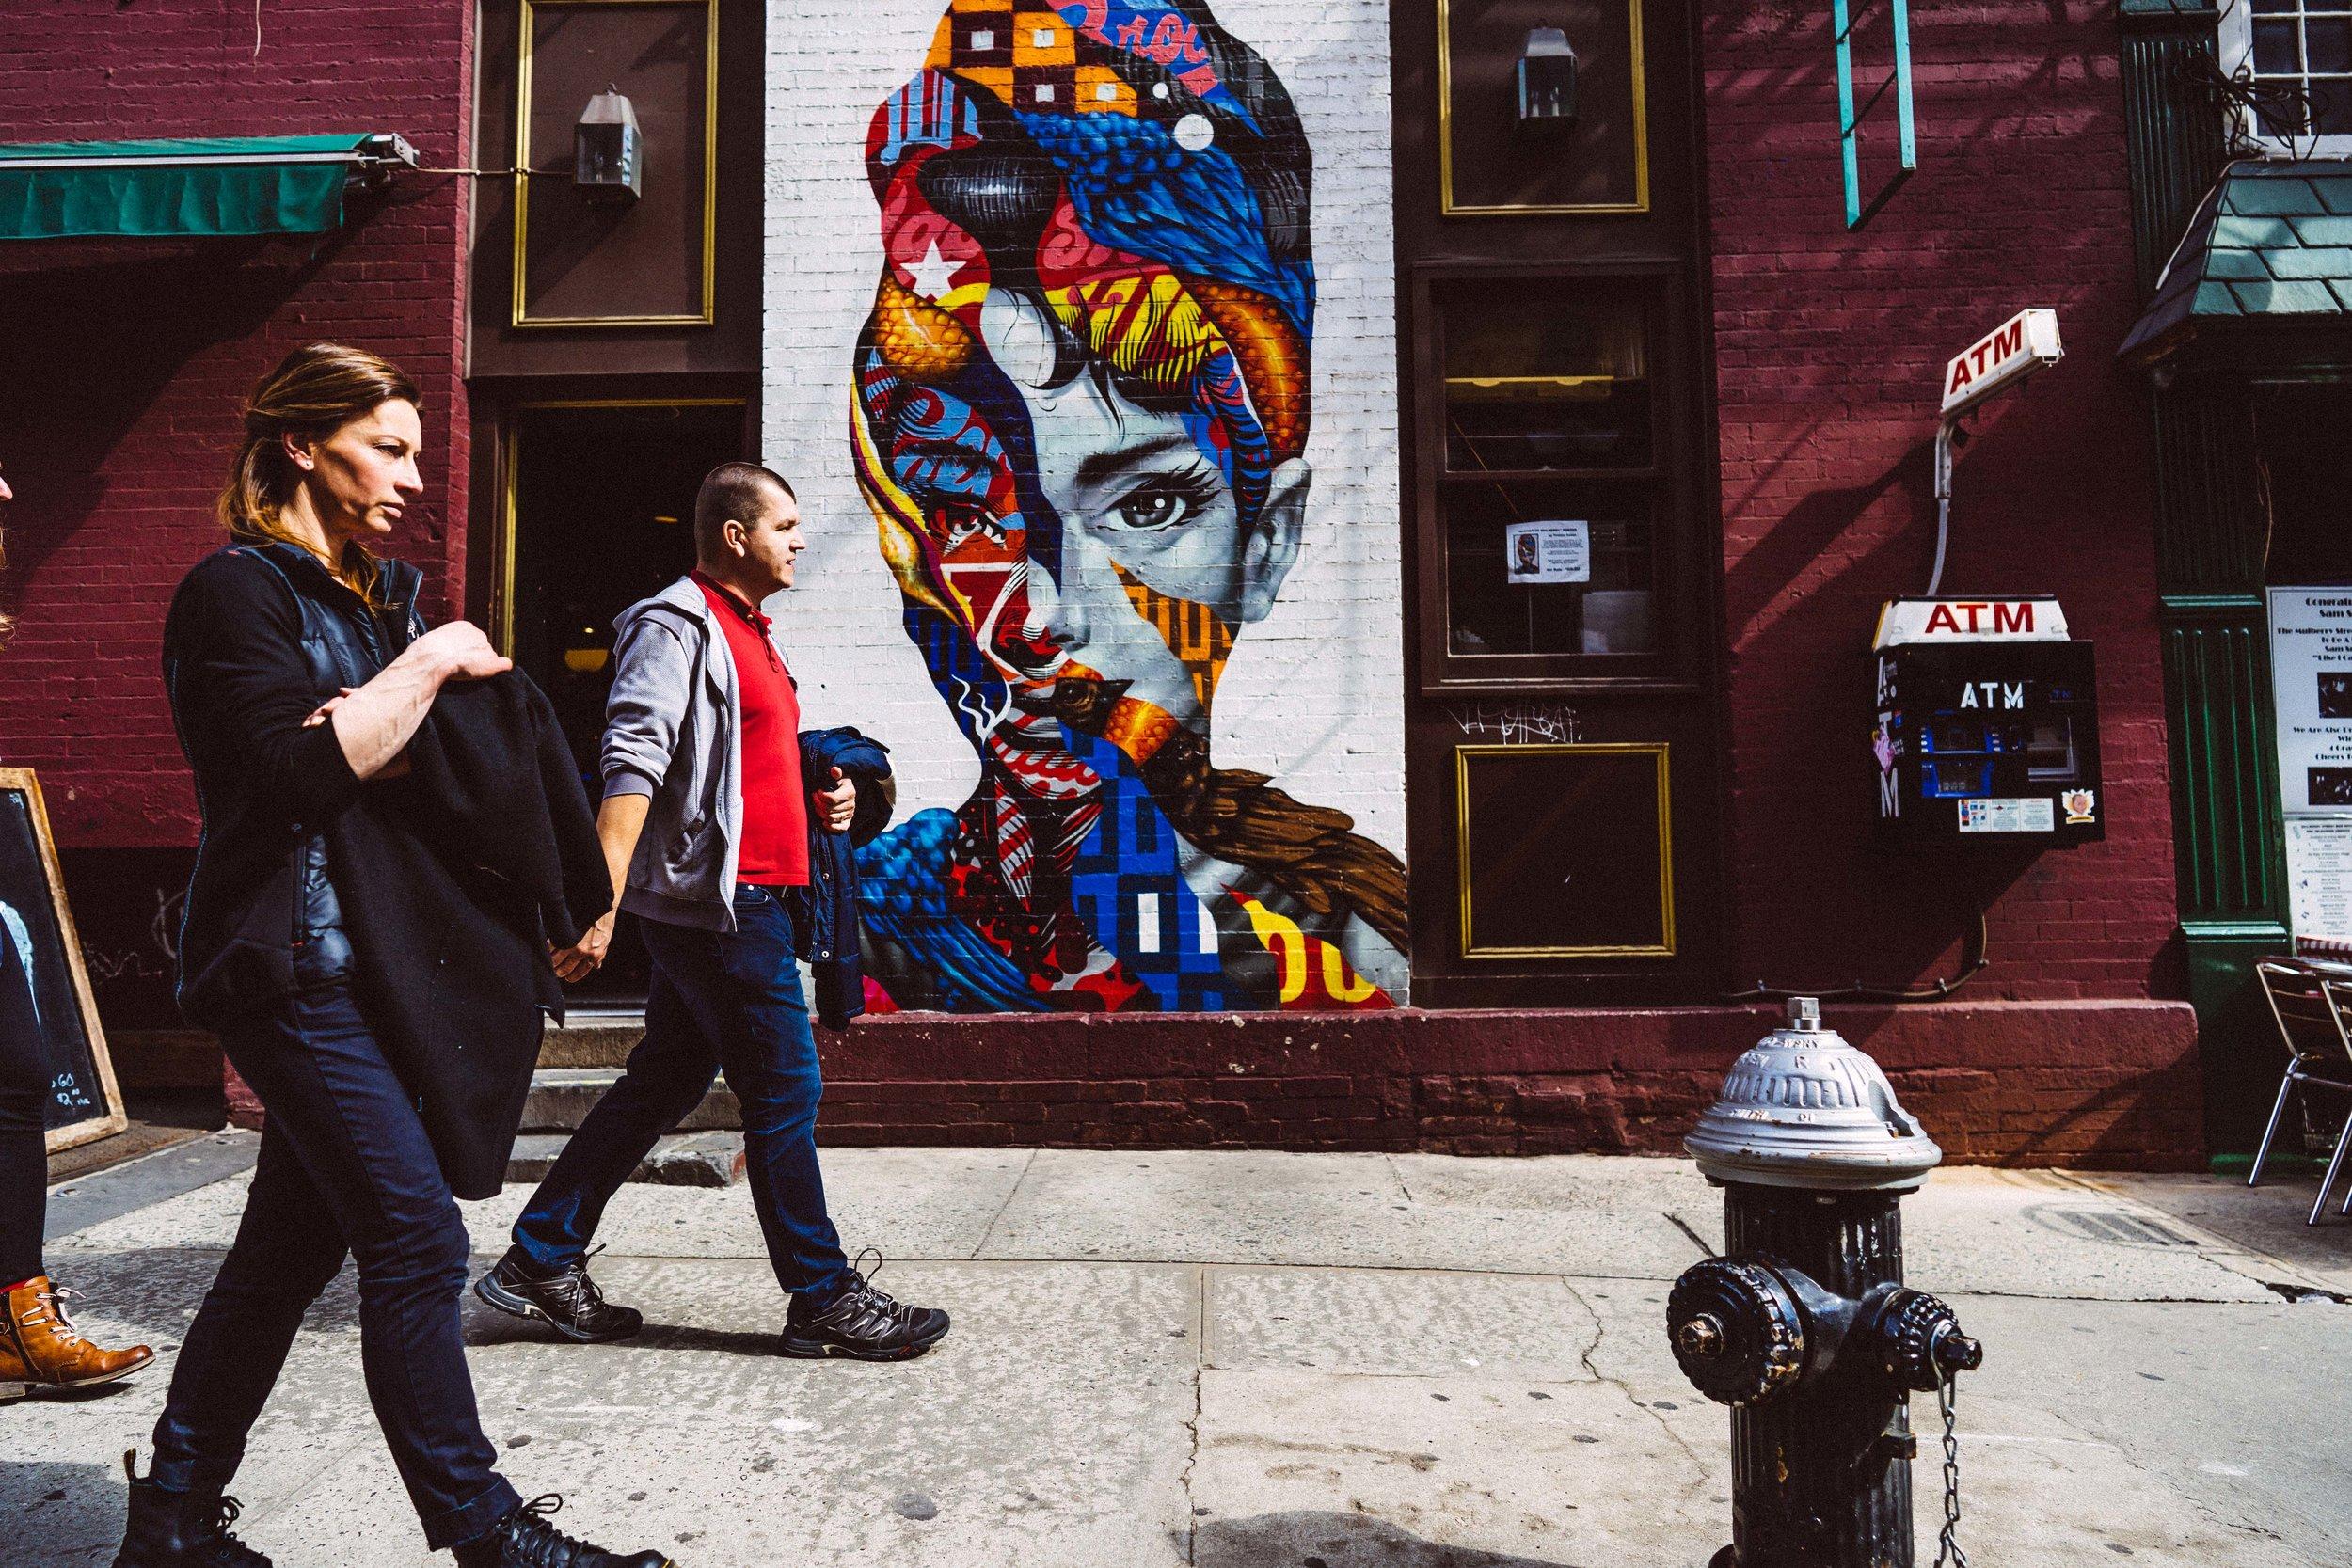 newyork-sony-102478.jpg